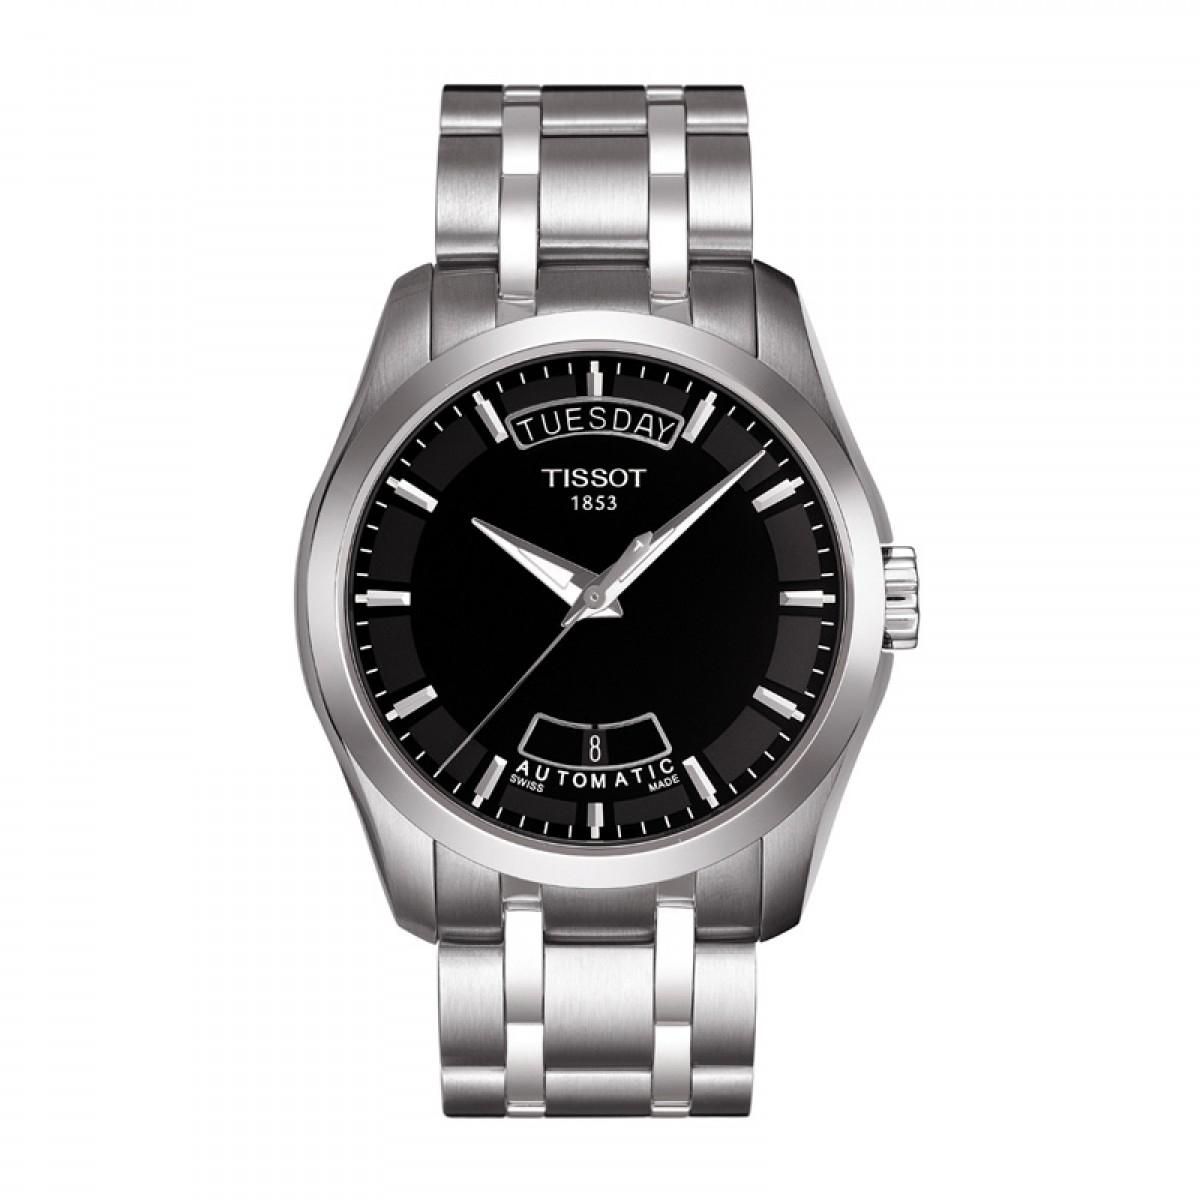 Часовник Tissot T035.407.11.051.00